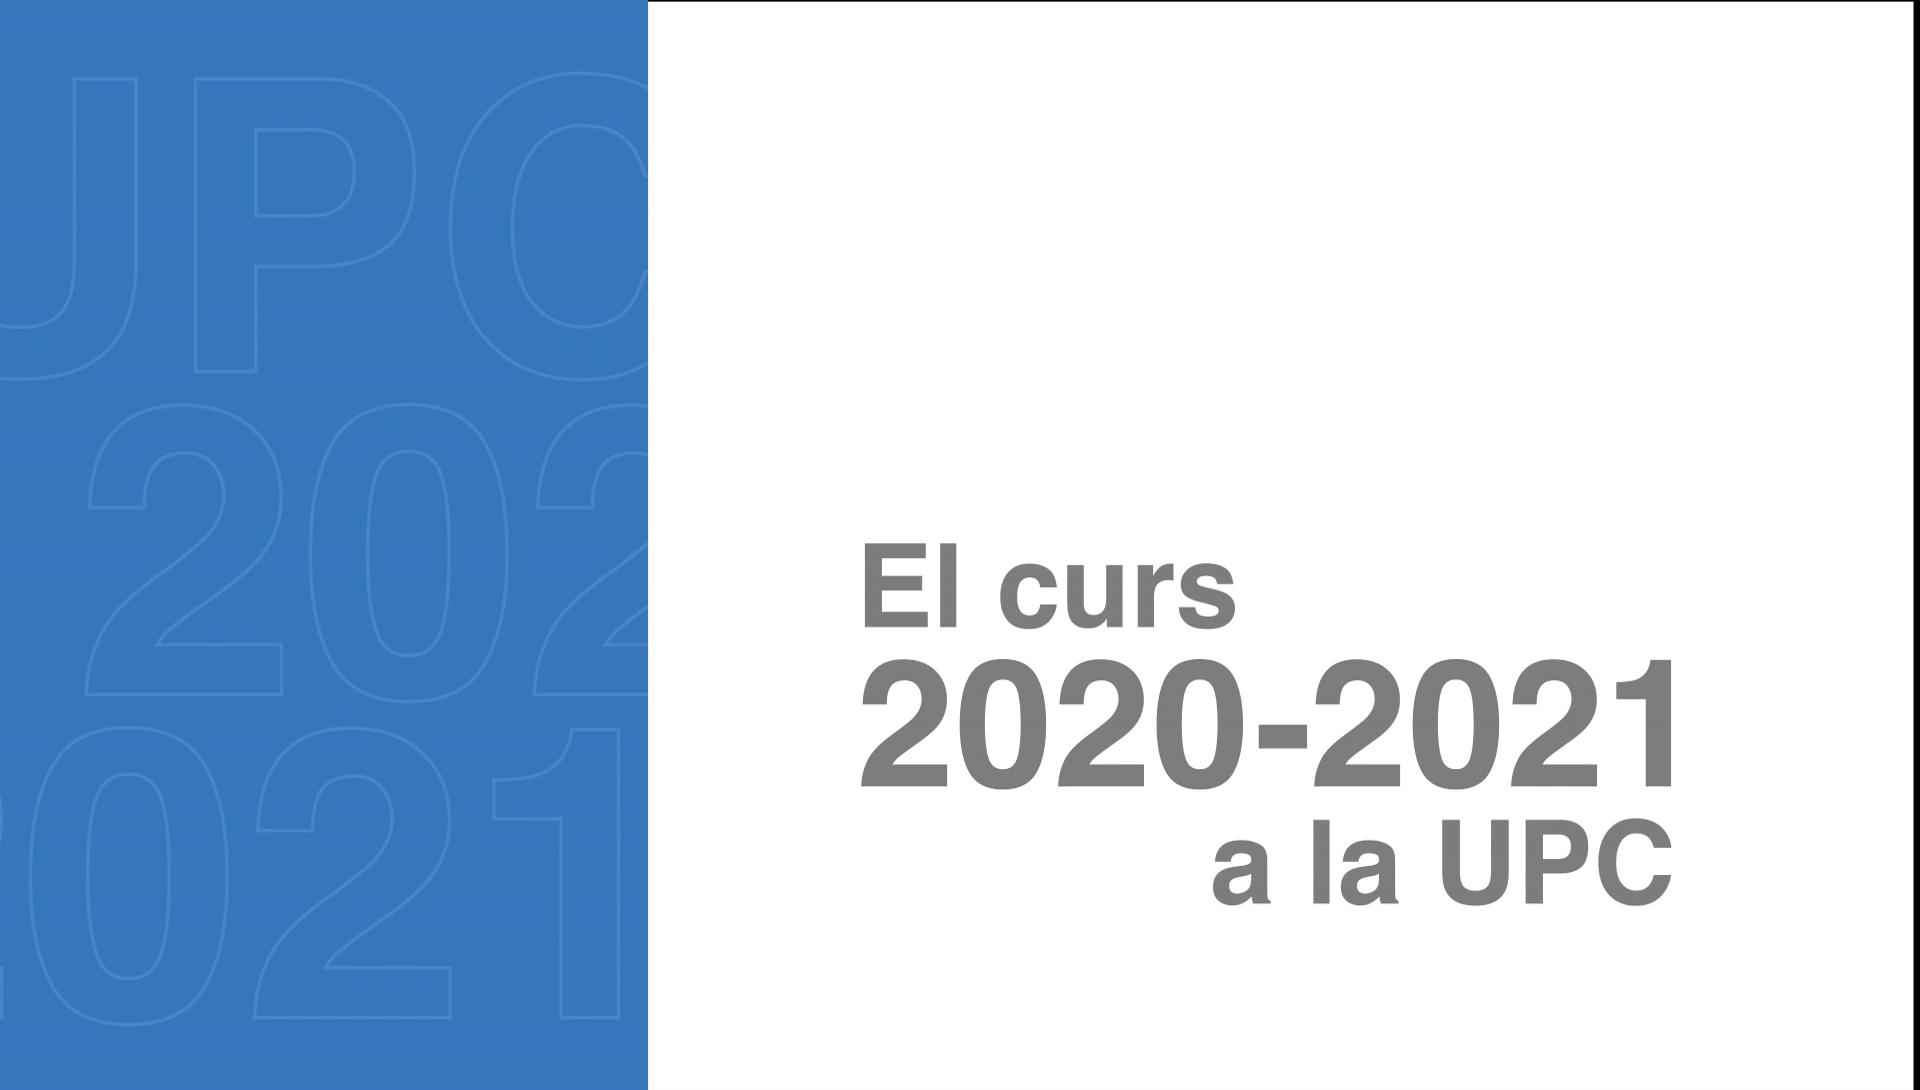 La UPC avui, curs 2021-22